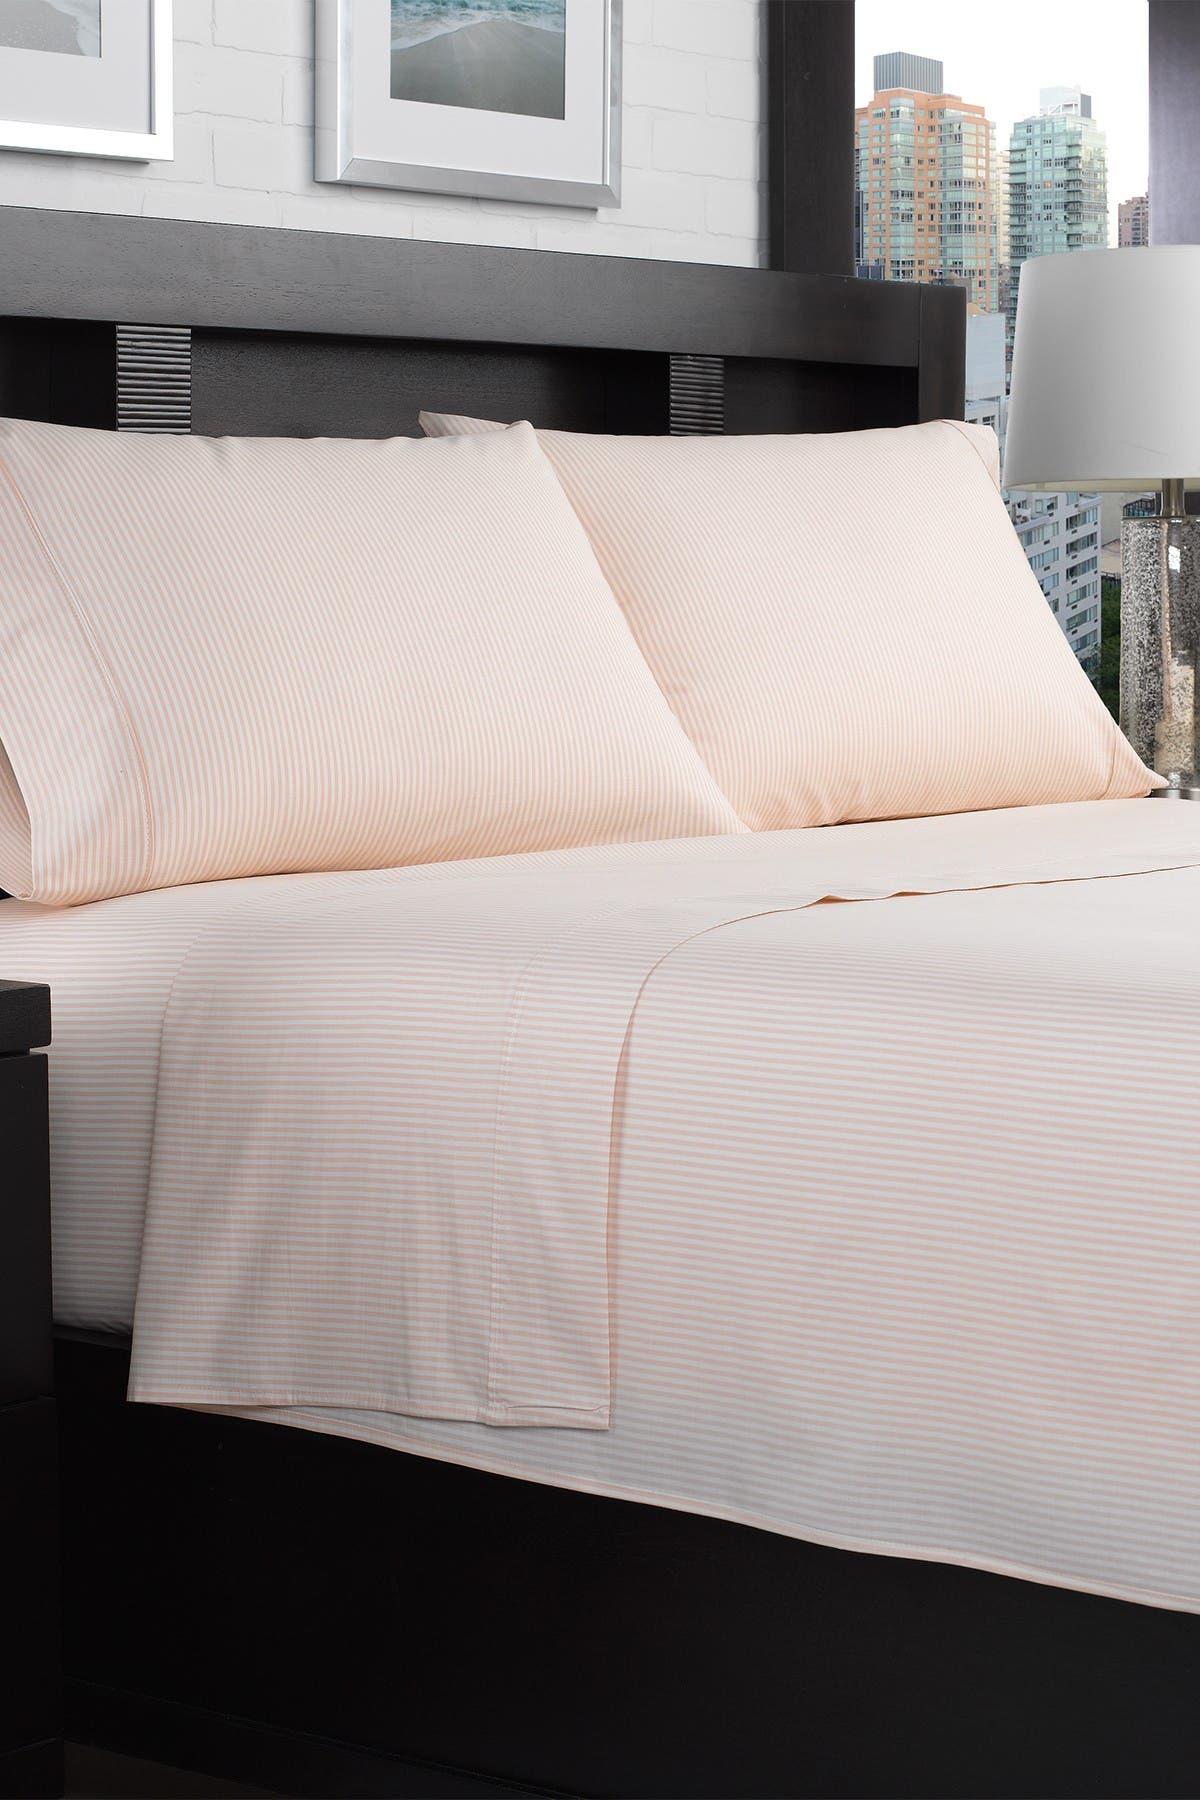 Image of Ella Jayne Home Stripe 200TC 100% Cotton Percale 4-Piece Full Sheet Set - Coral